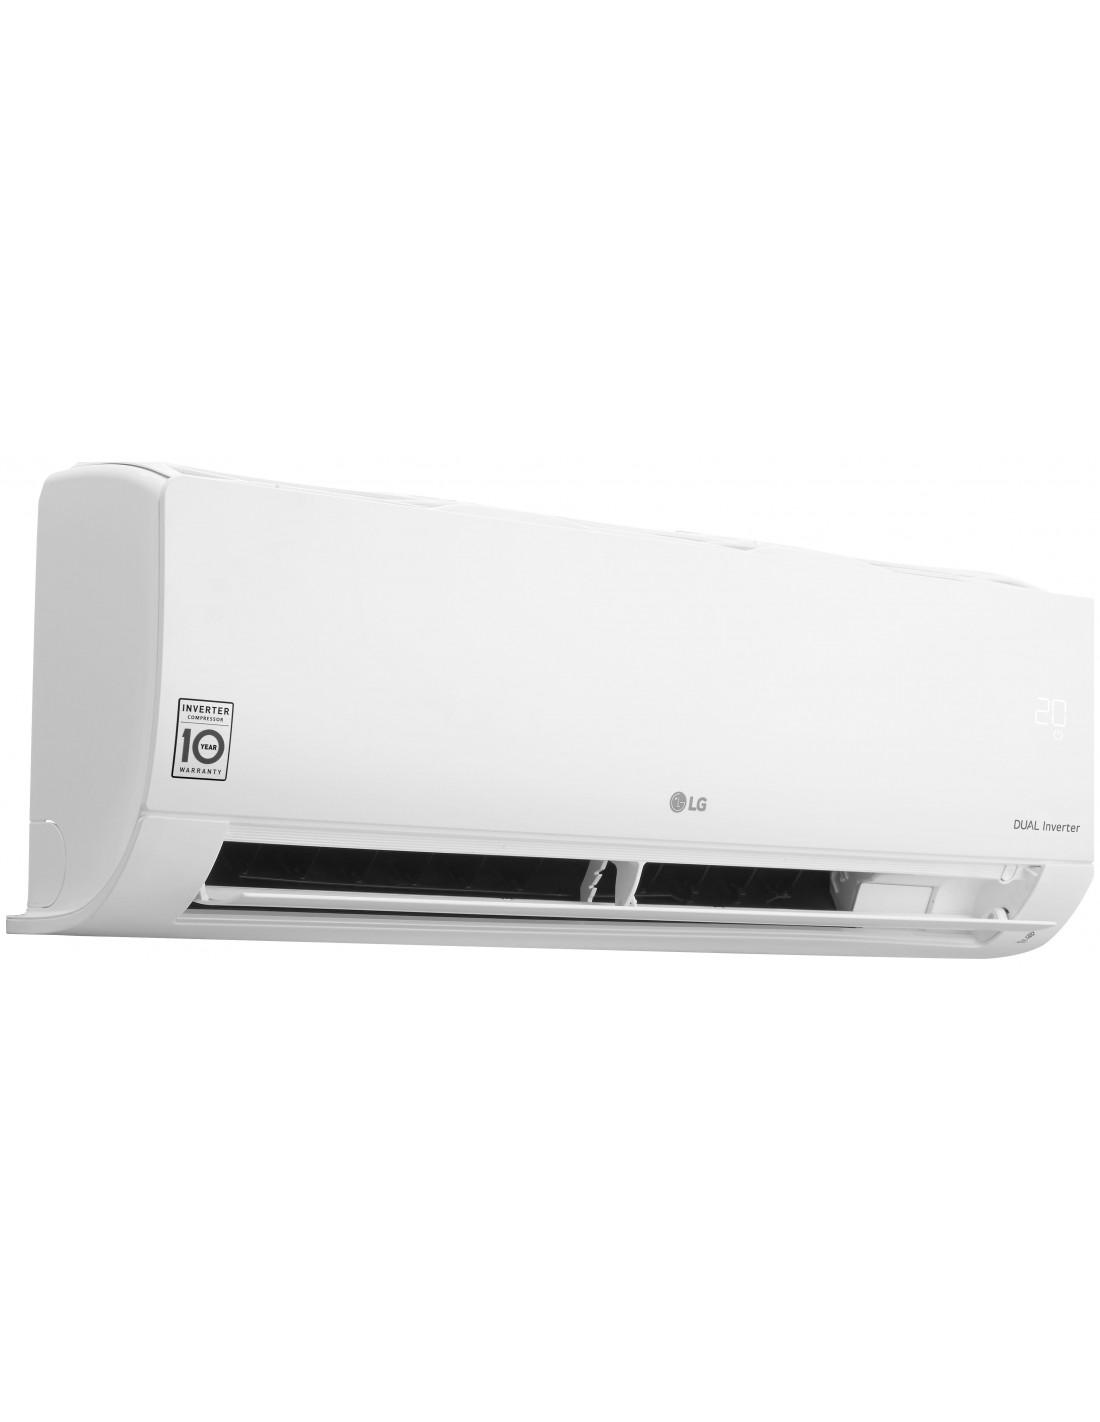 Lavadora Bosch Way28740ee 8kg 1400rpm A+++ 30% Ecosilence Pantalla Tft Iluminacion Del Tambor